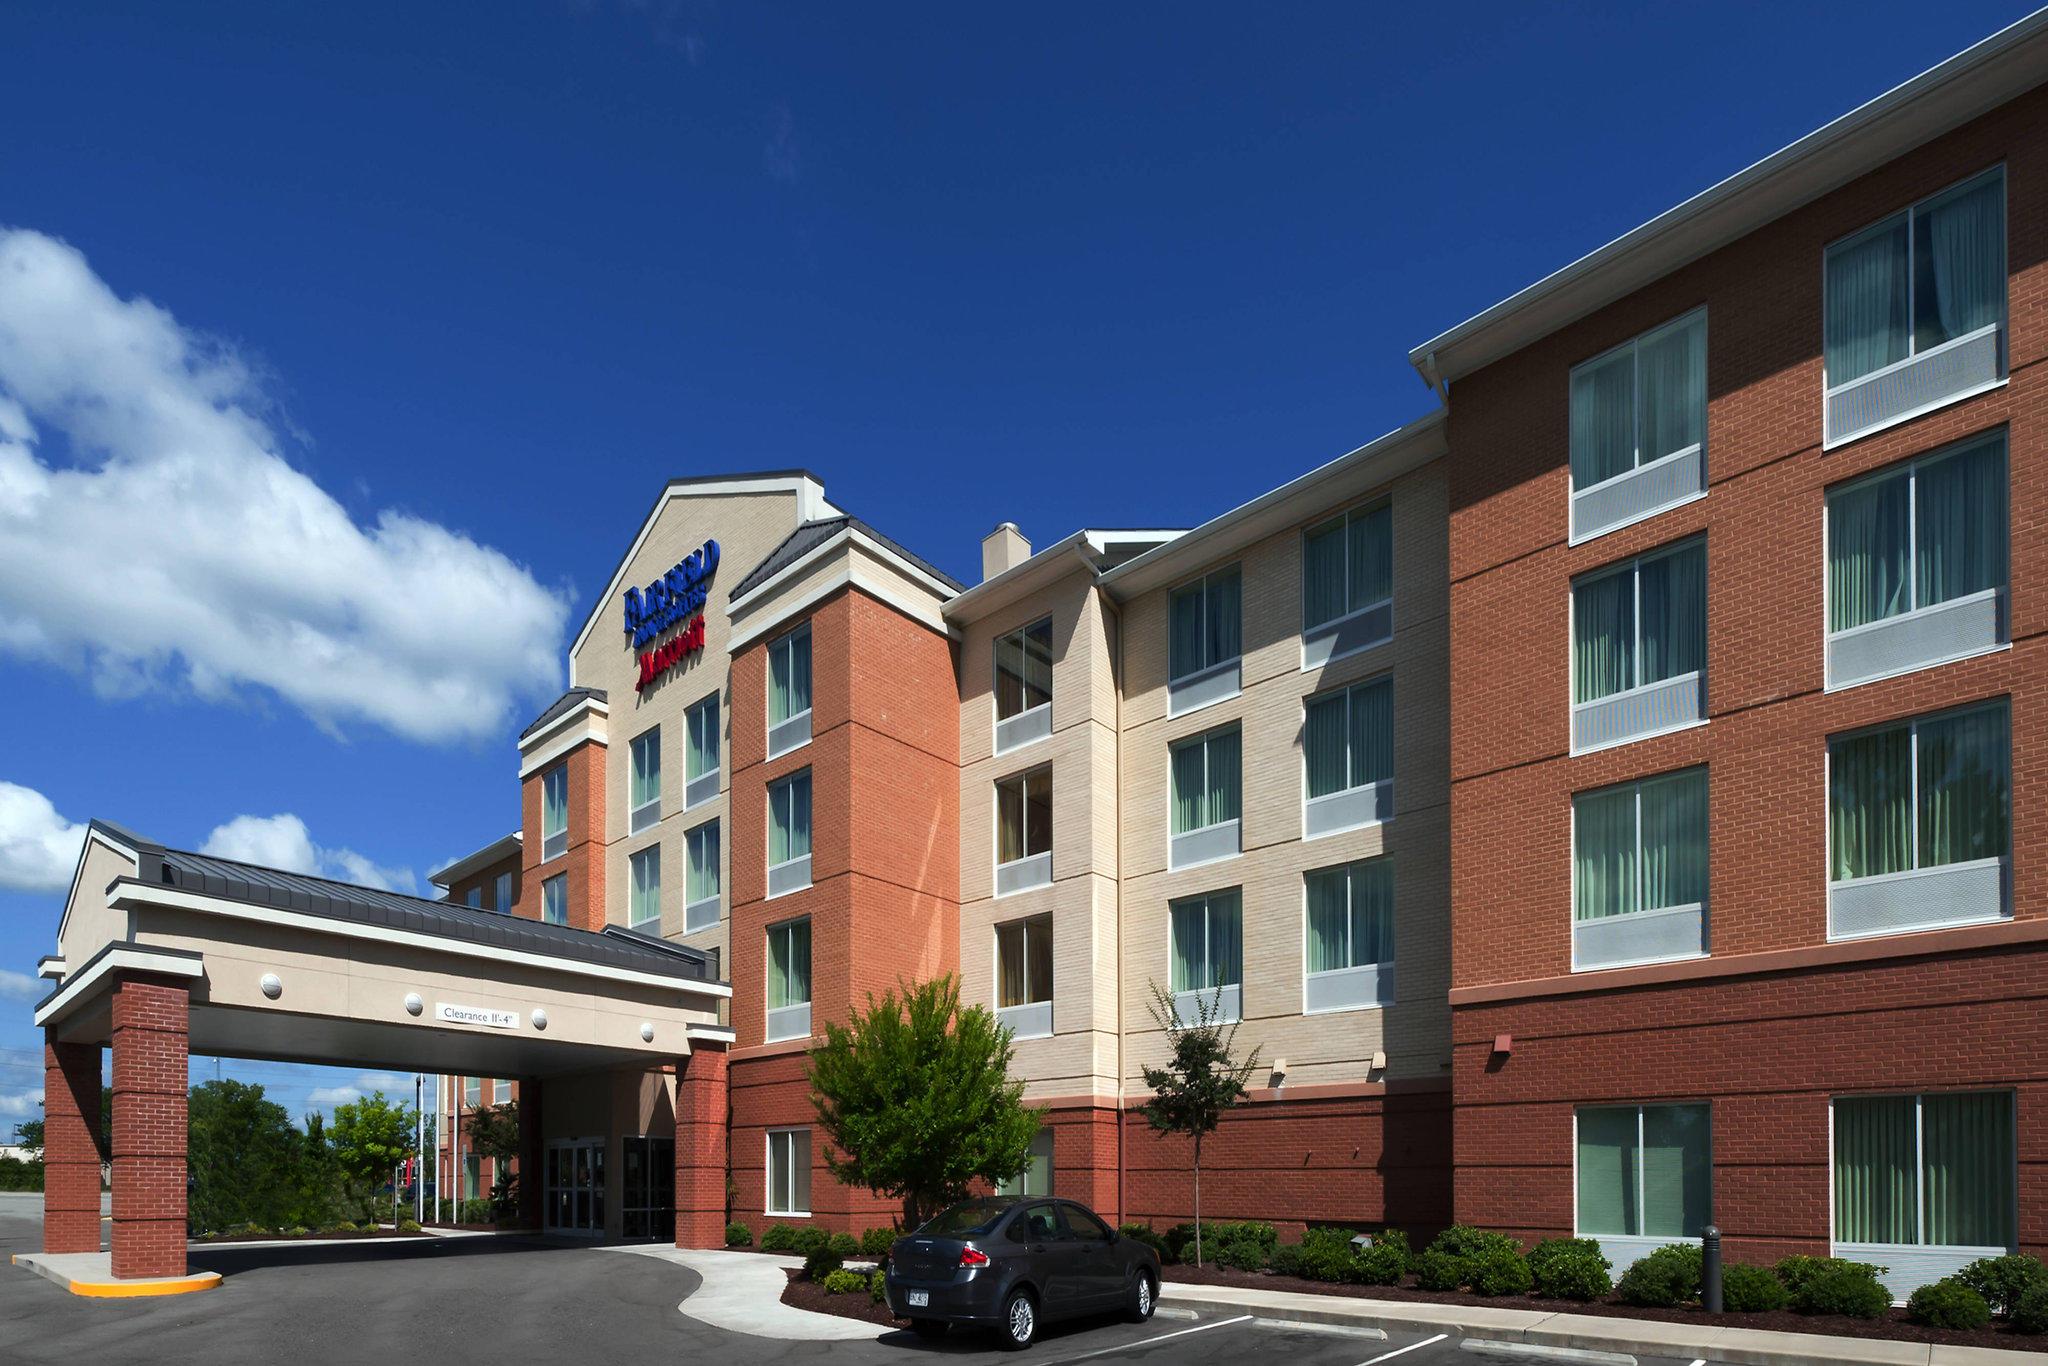 Fairfield Inn & Suites by Marriott Wilmington/Wrightsville Beach